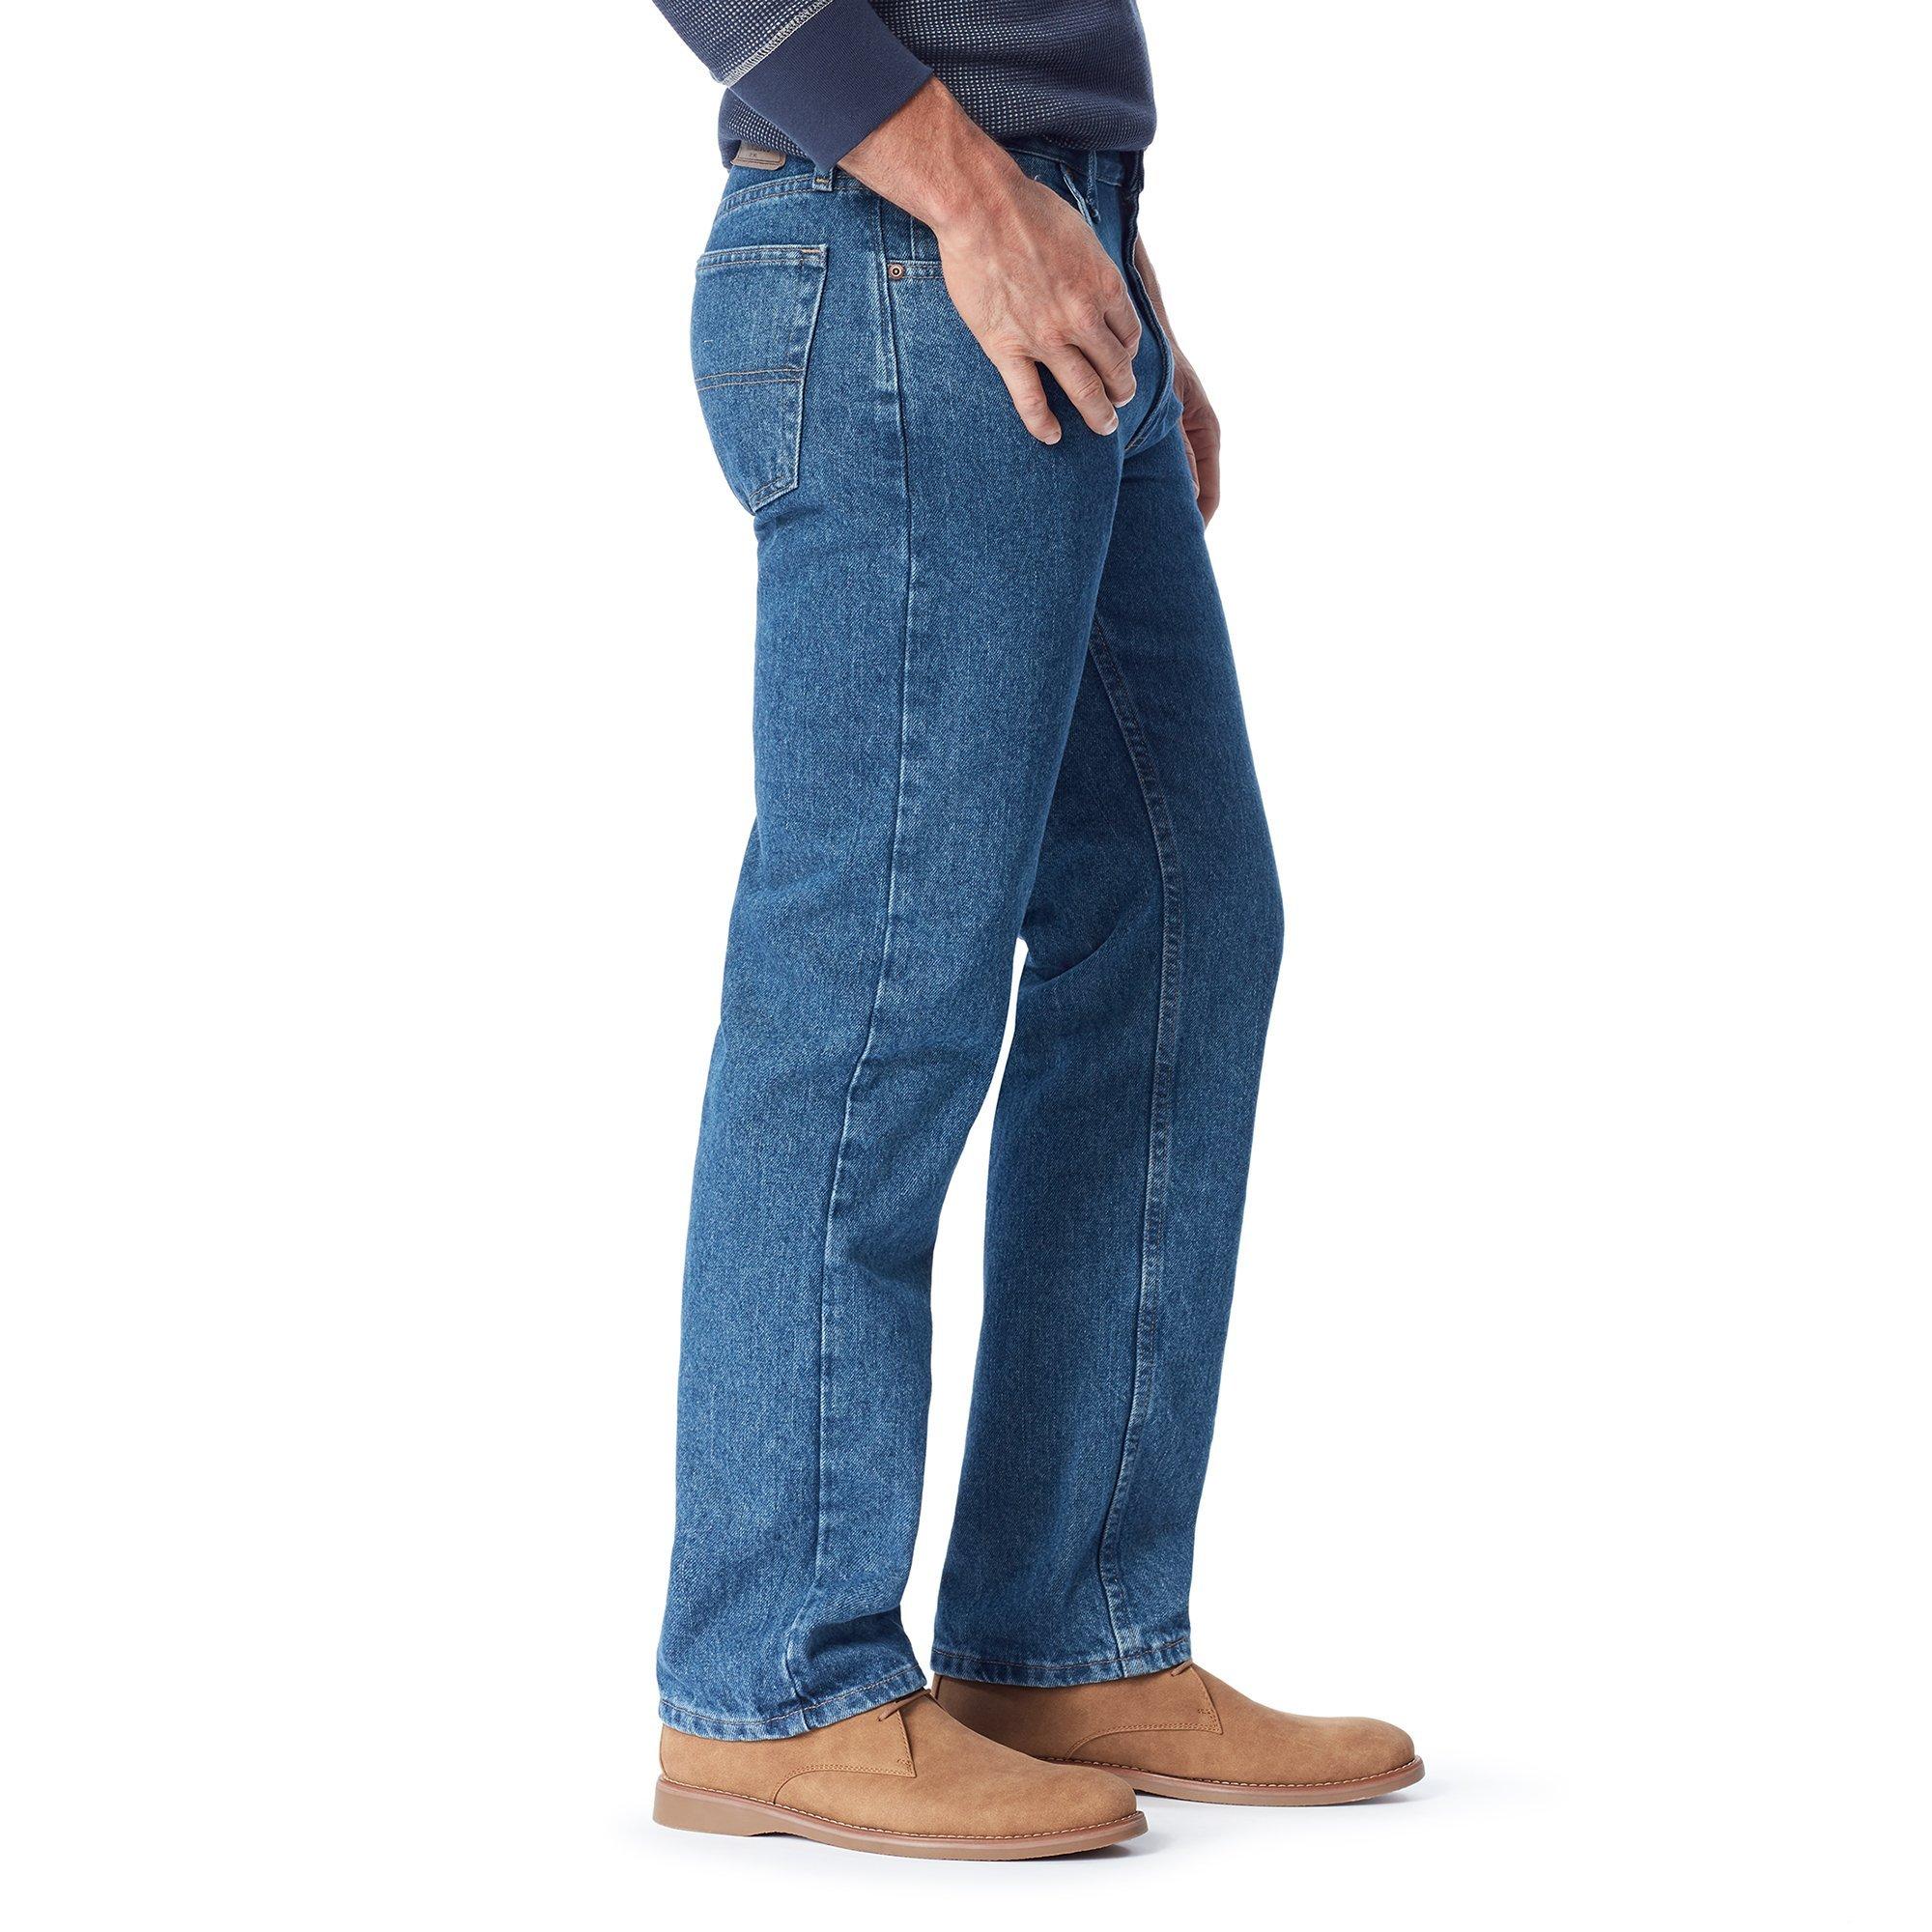 Wrangler Authentics Men's Classic 5-Pocket Regular Fit Jean,Stonewash Dark,42x28 by Wrangler (Image #6)